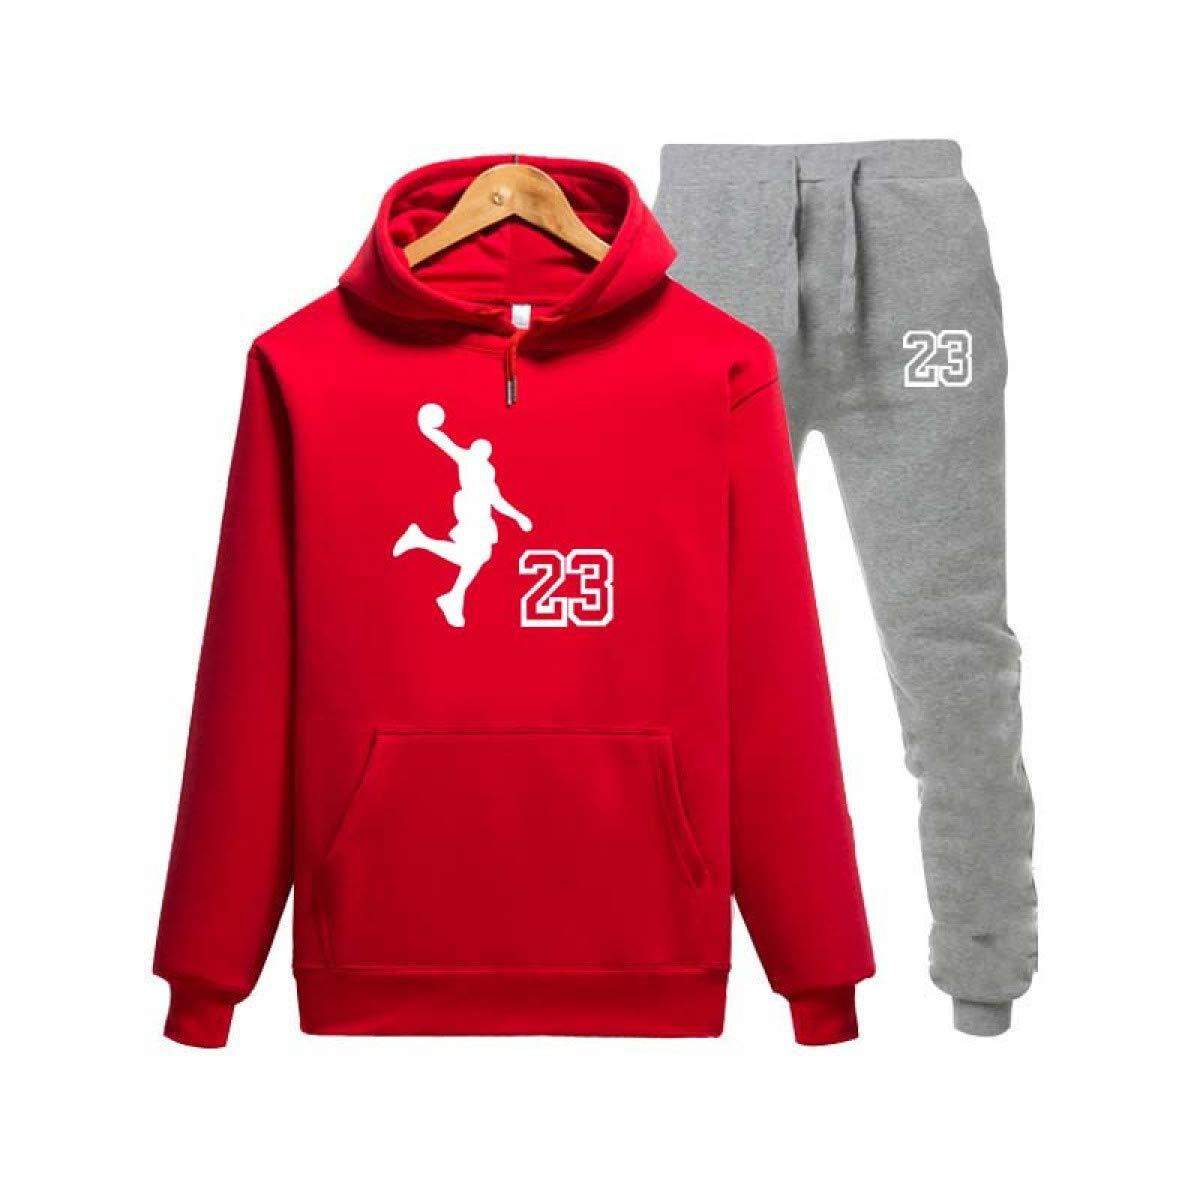 Amazon.com: Jordan 23 Sport Suit Sudadera con capucha para ...